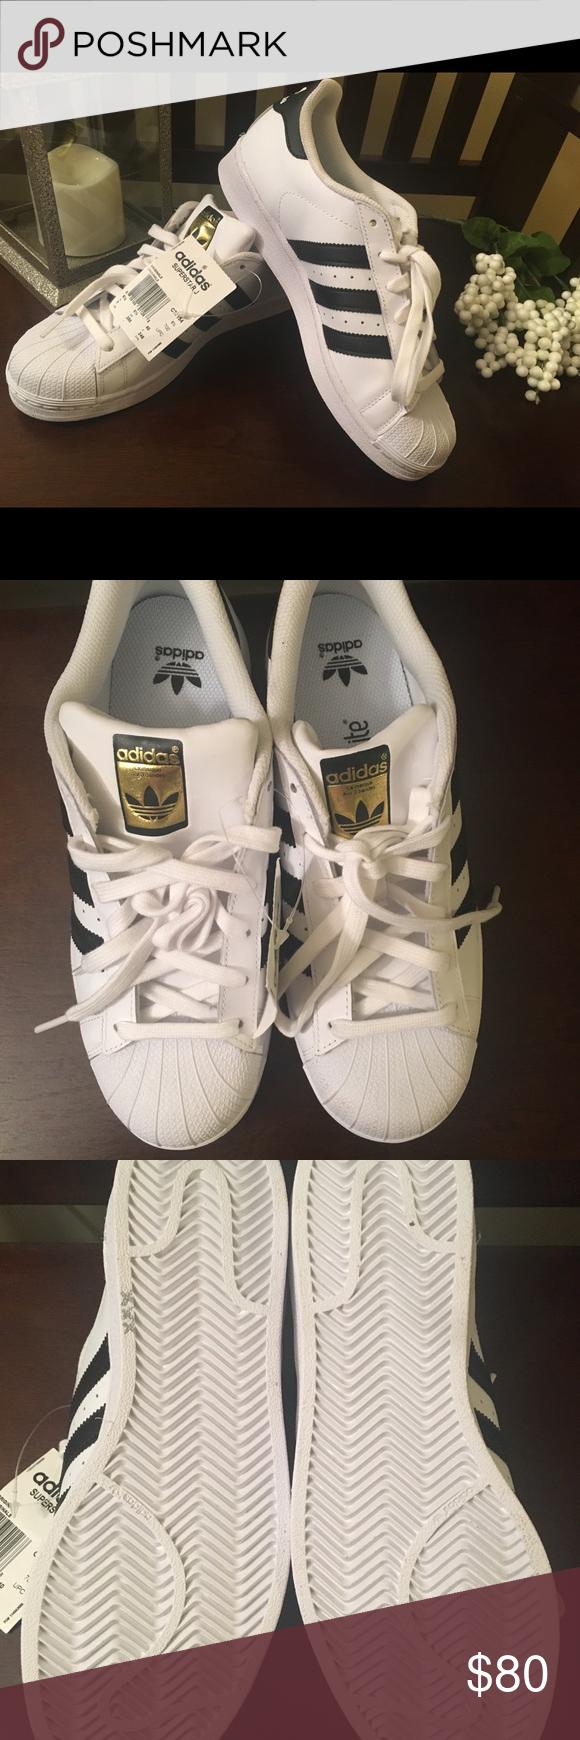 adidas superstar black white gold size 7